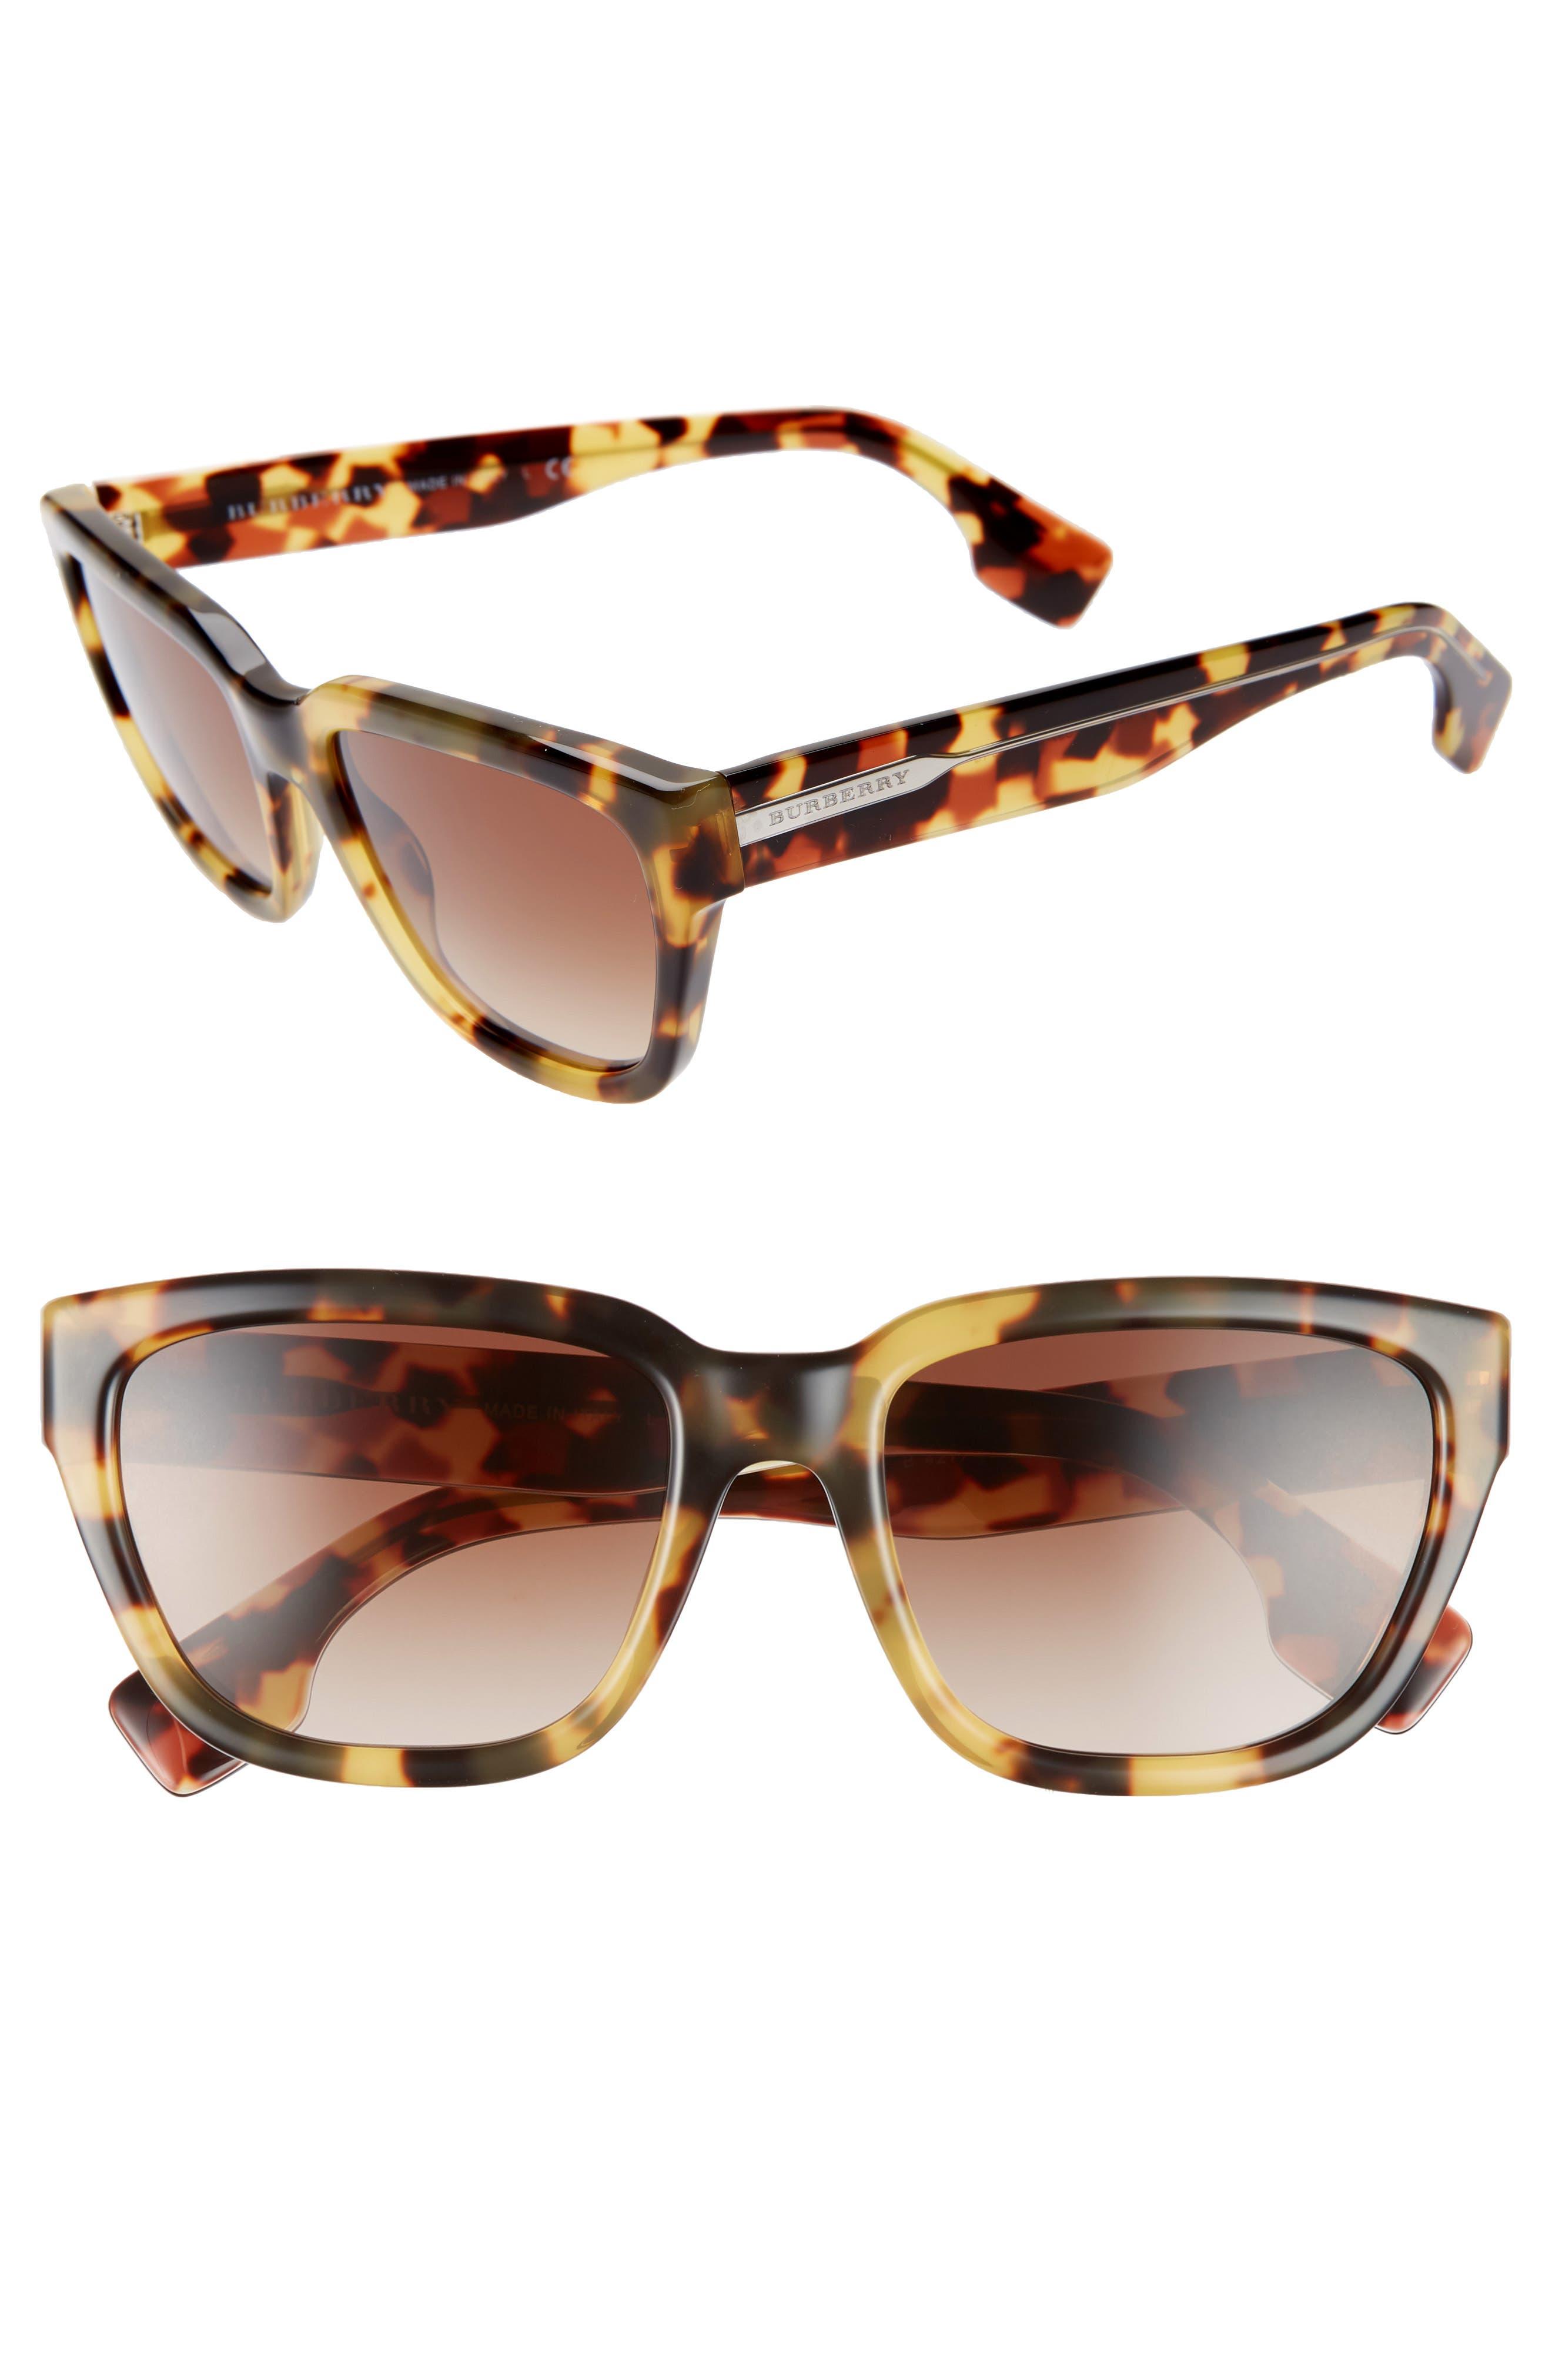 22536a11a5f4 Burberry Sunglasses for Women